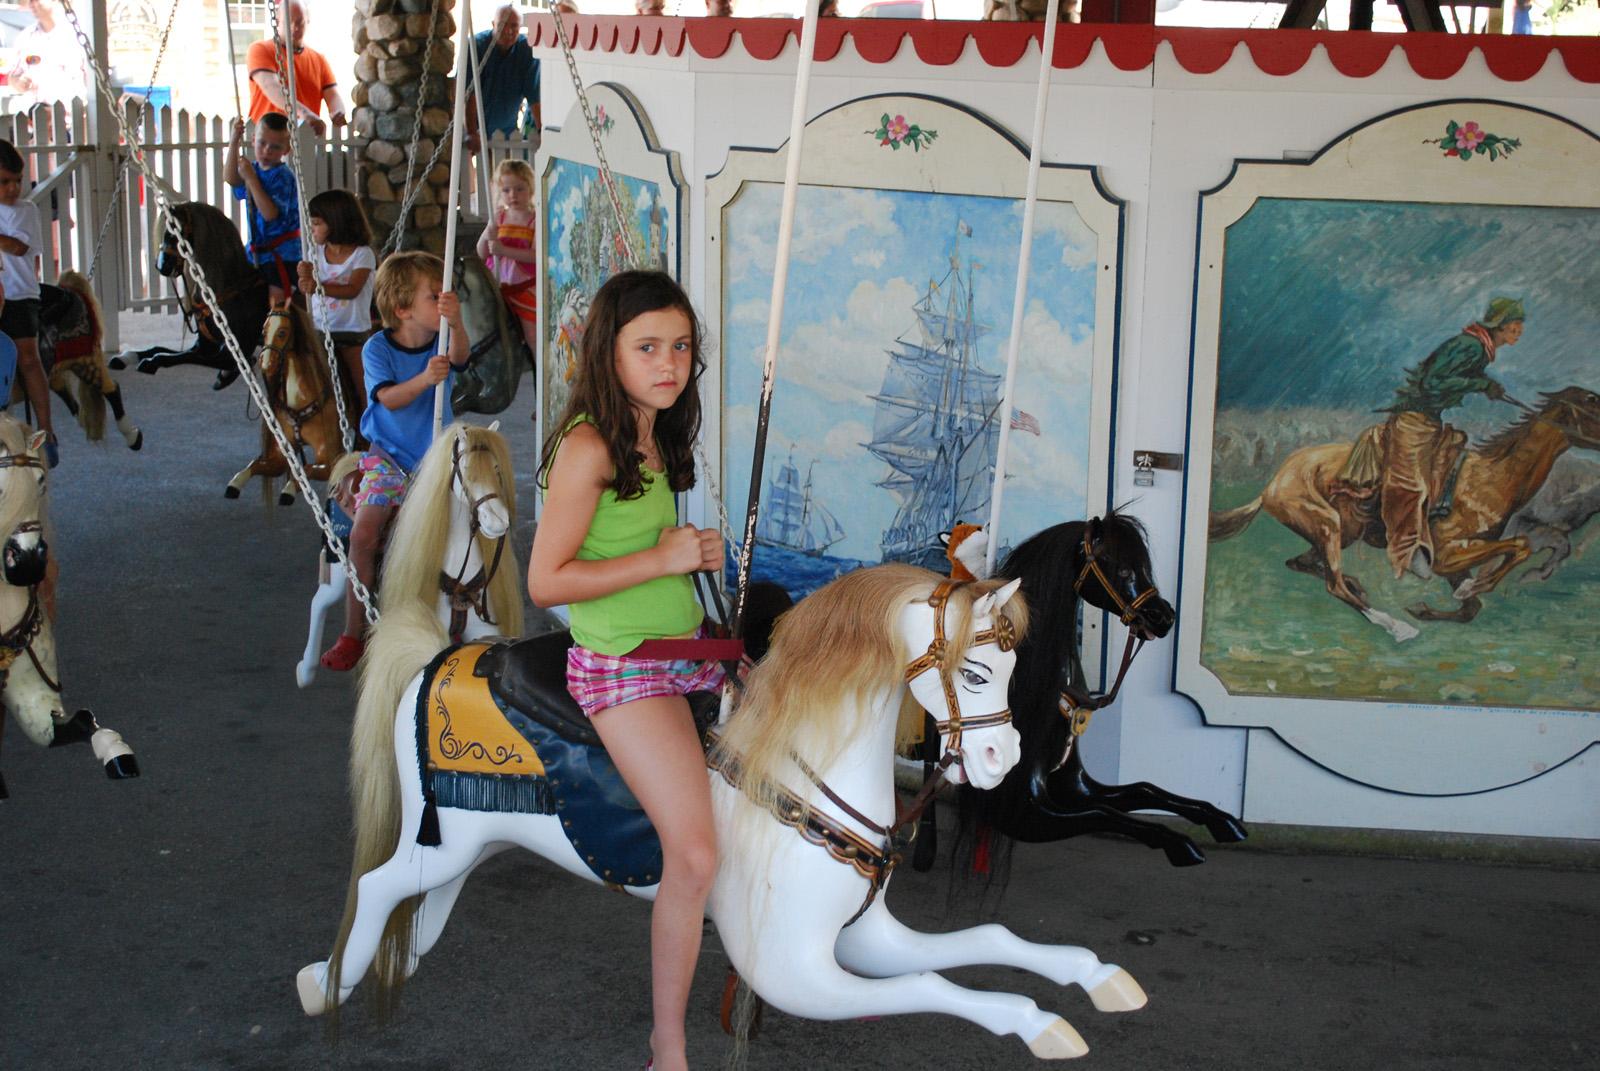 Watch-Hill-RI-1884-historic-carousel-Dare-swing-ride-28